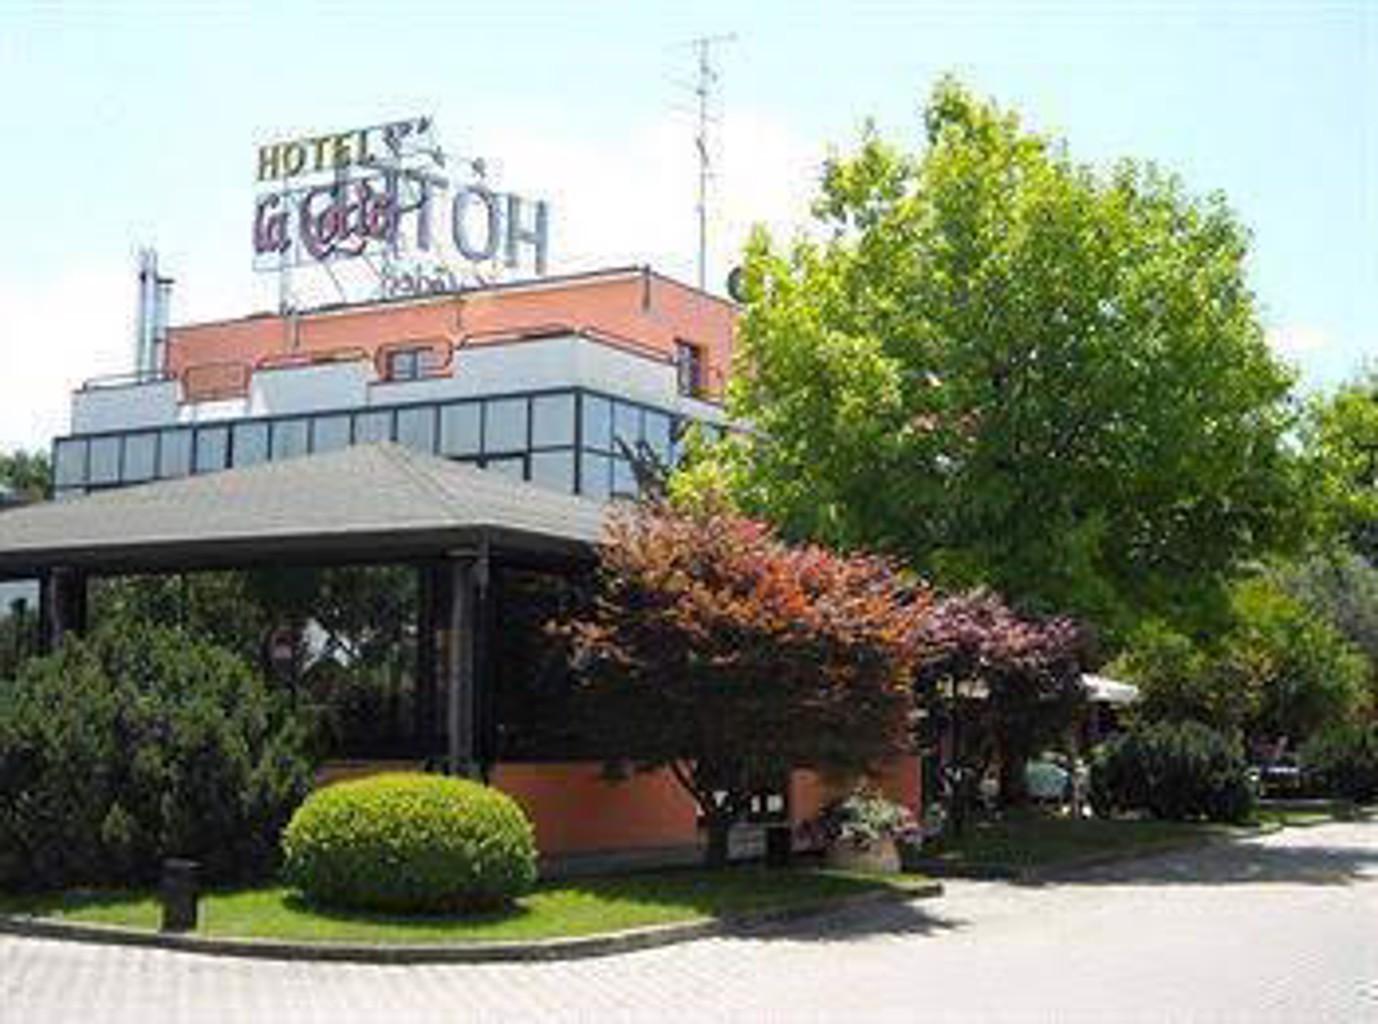 Gallery image of Hotel La Corte